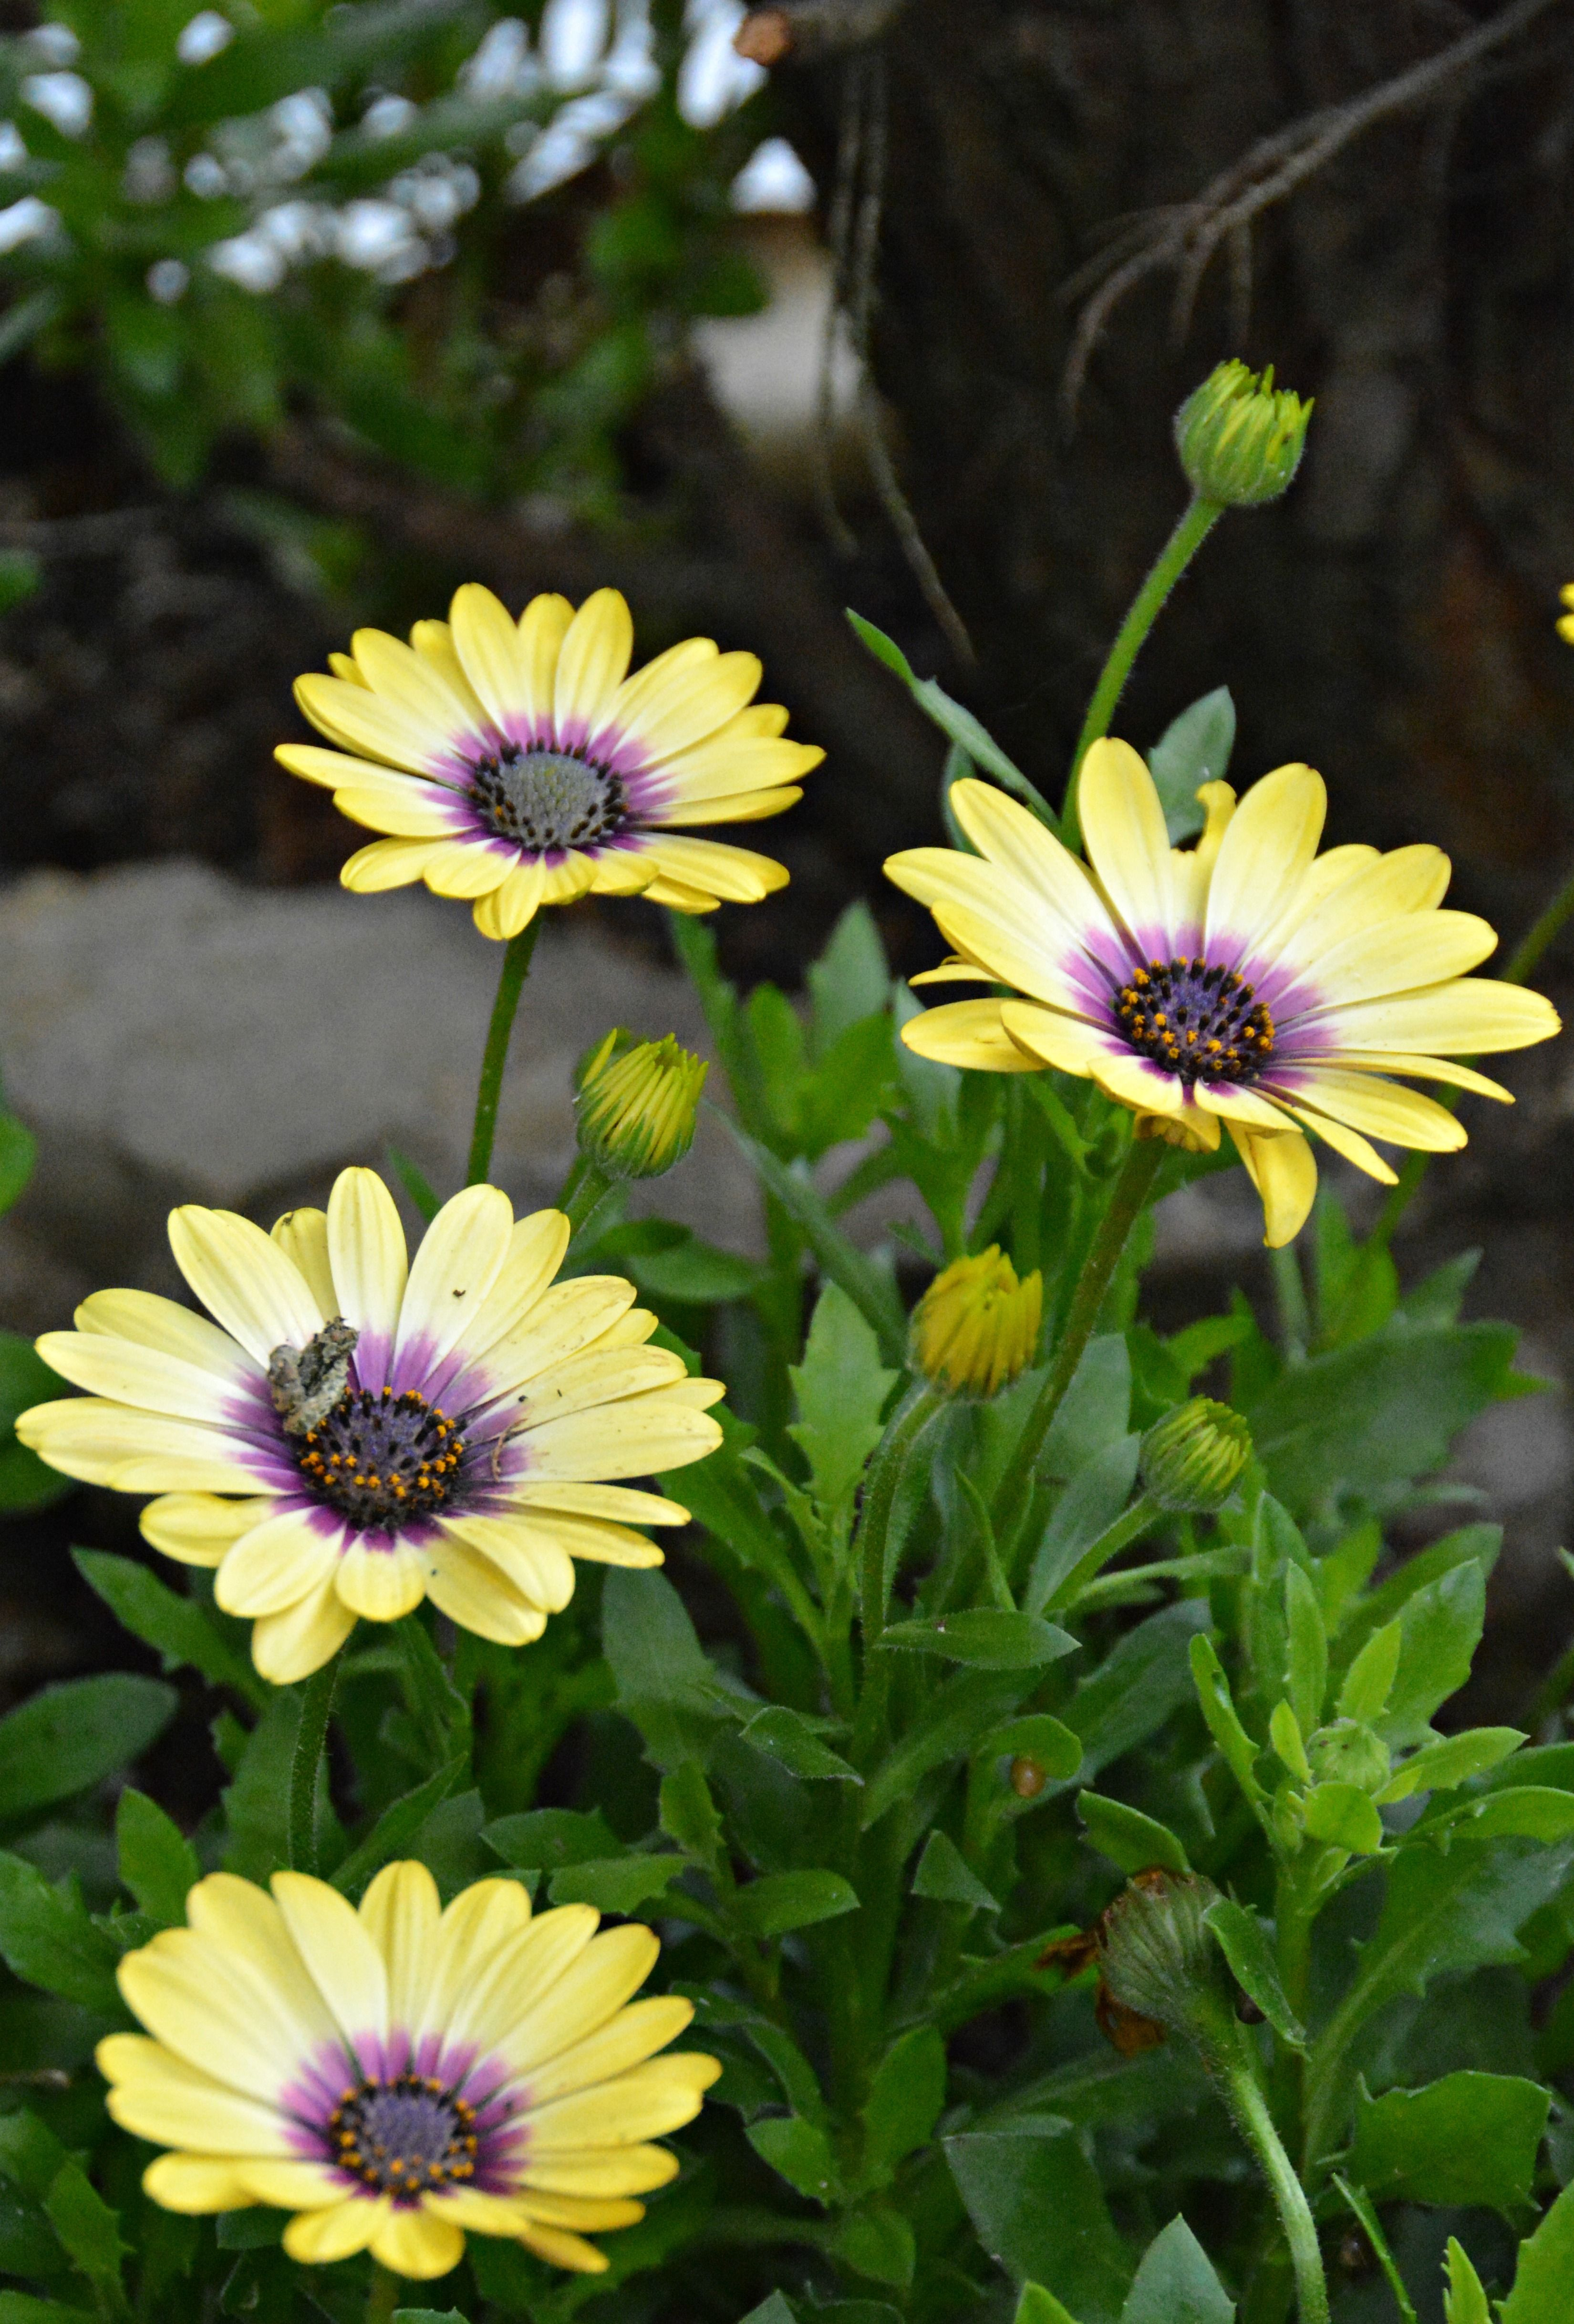 Osteospermum Yellow In My Garden Wil 3436 Flower Names A To Z